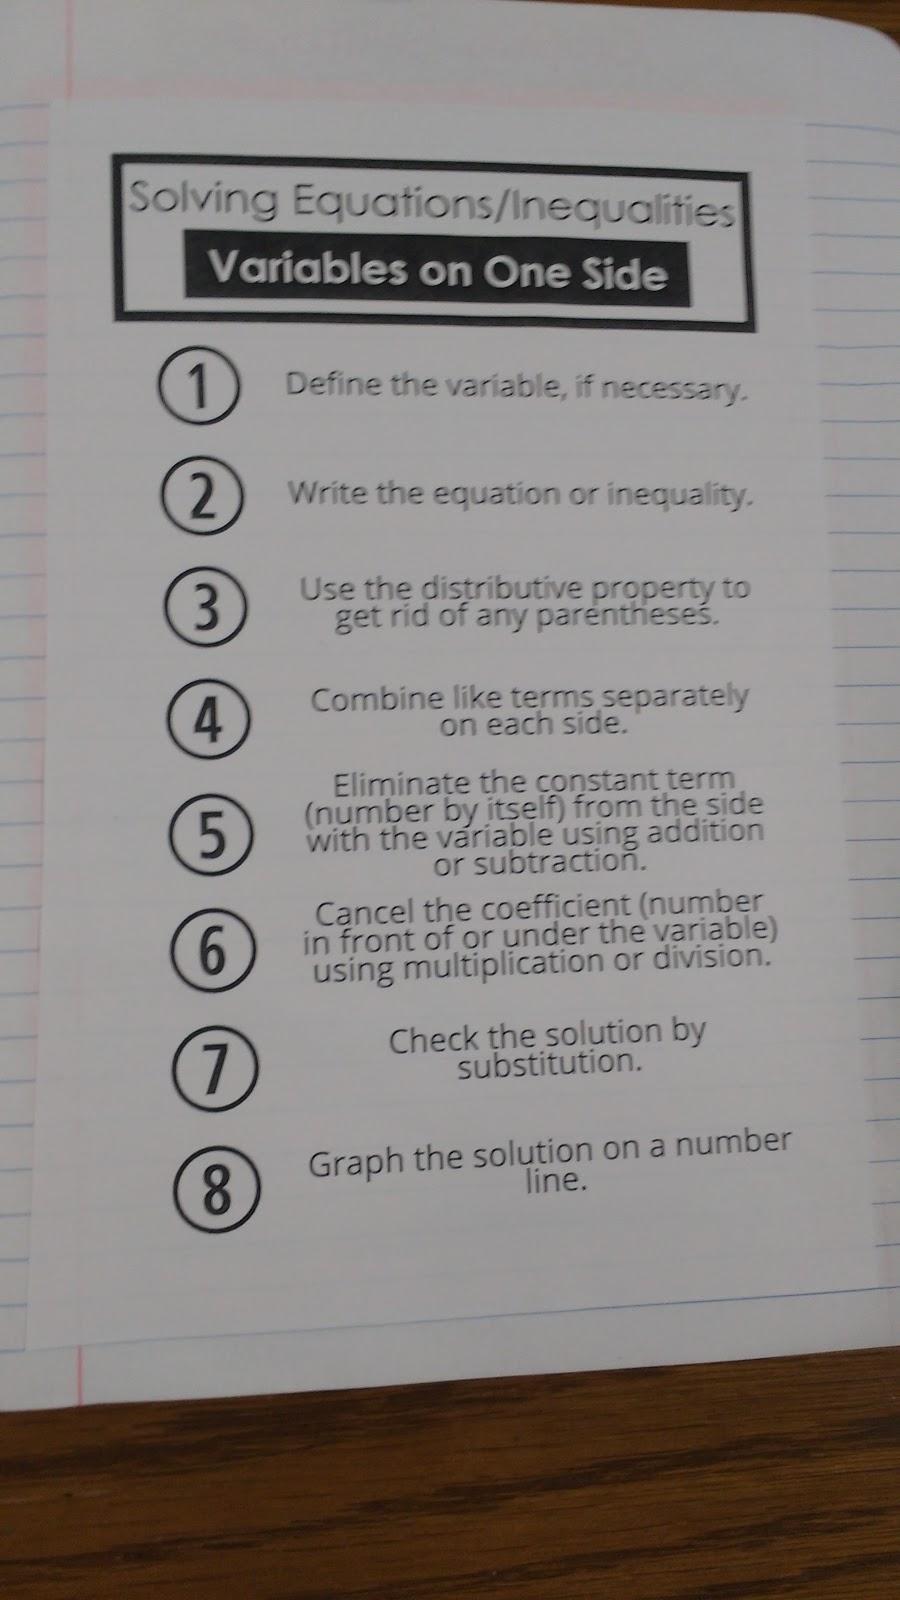 Math = Love: Algebra 1 Solving Equations and Inequalities